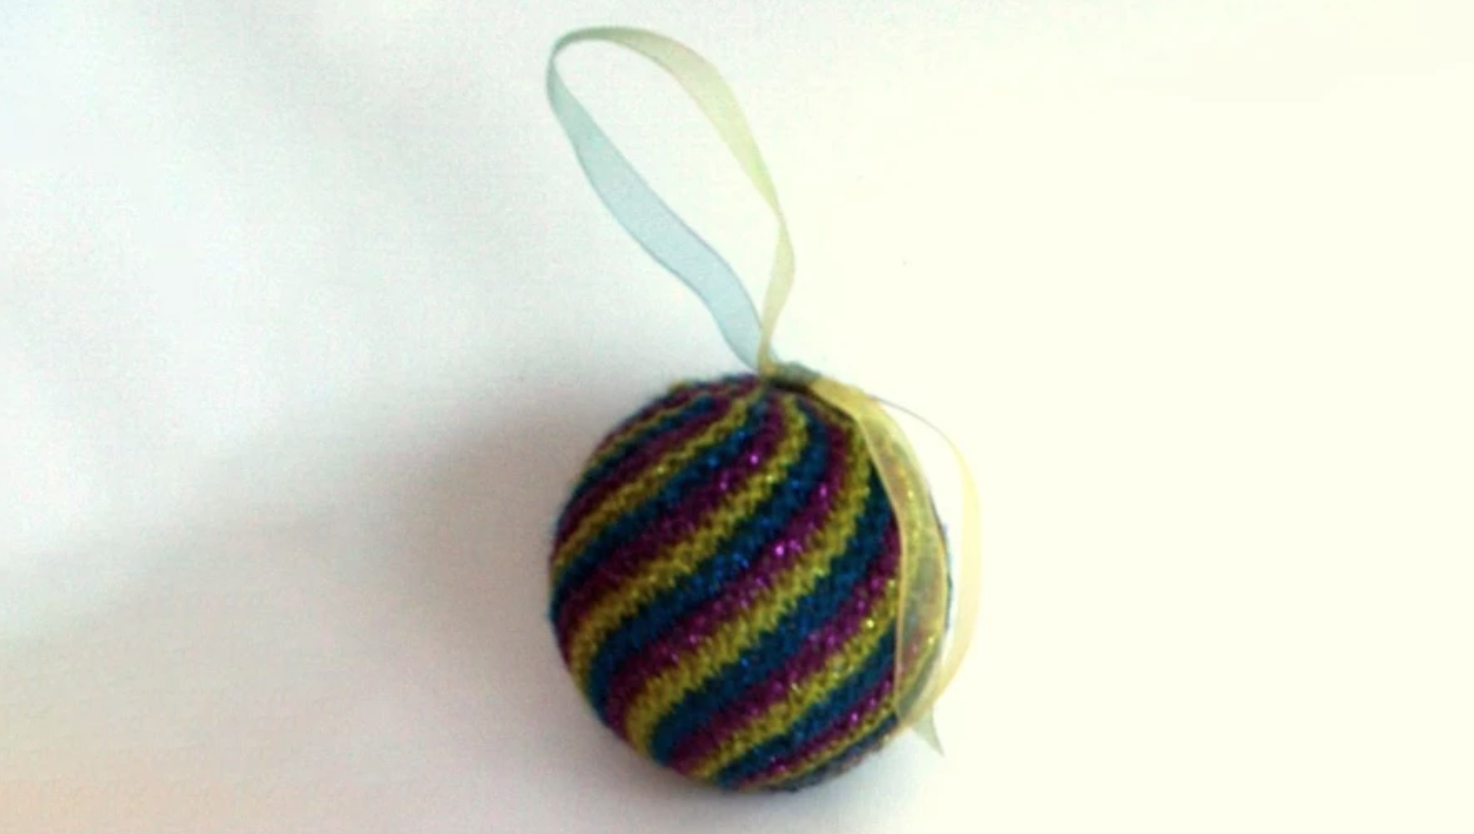 knit swirled striped ornament